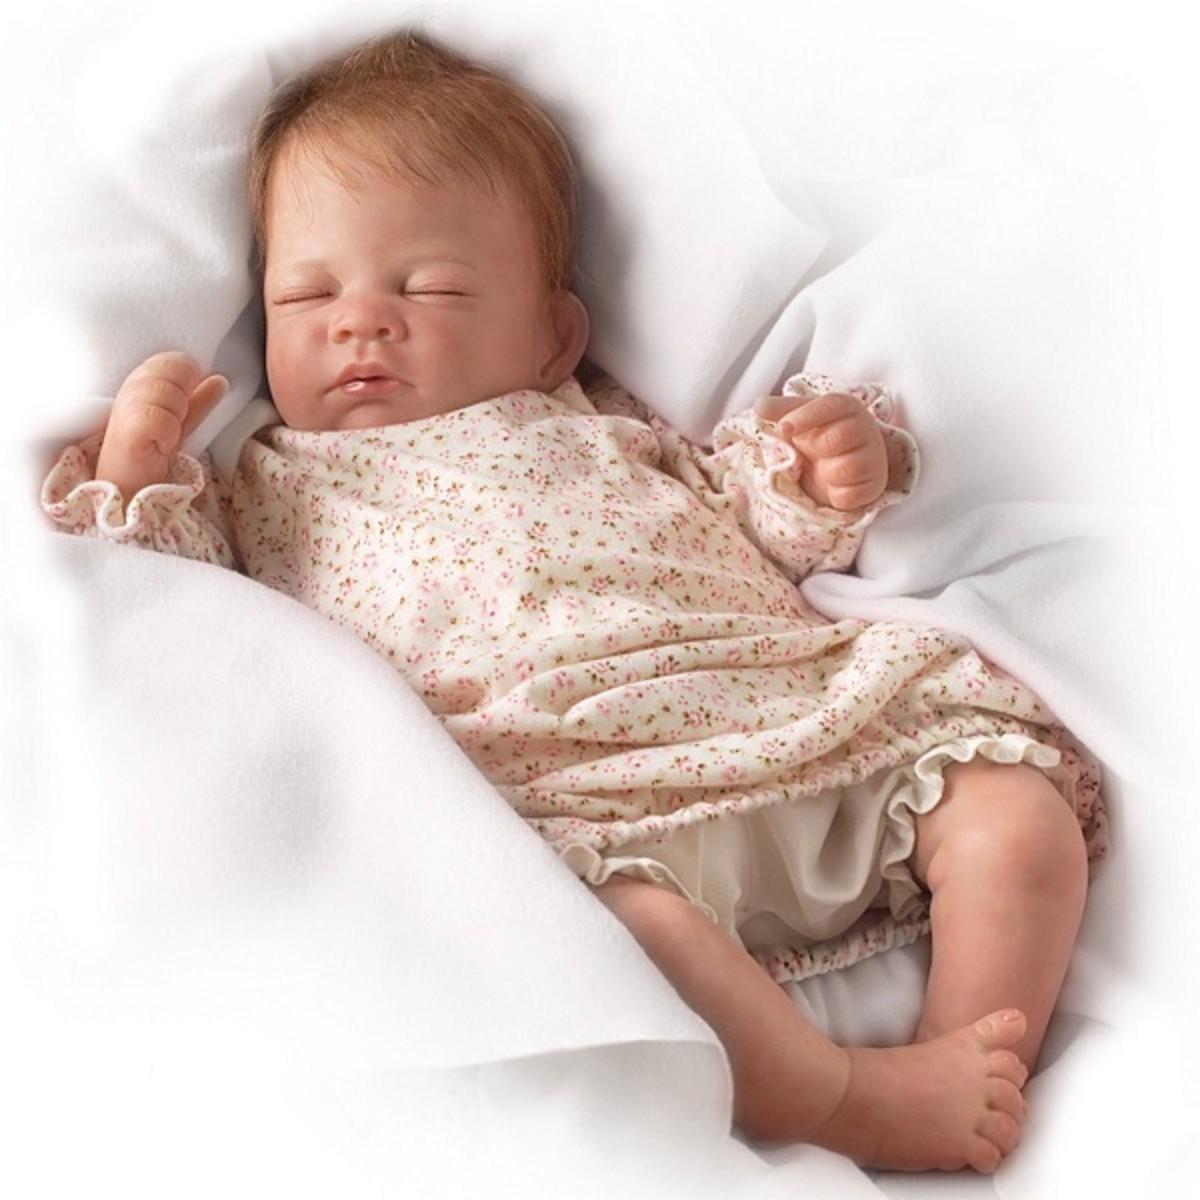 Shhh... She's waking up...